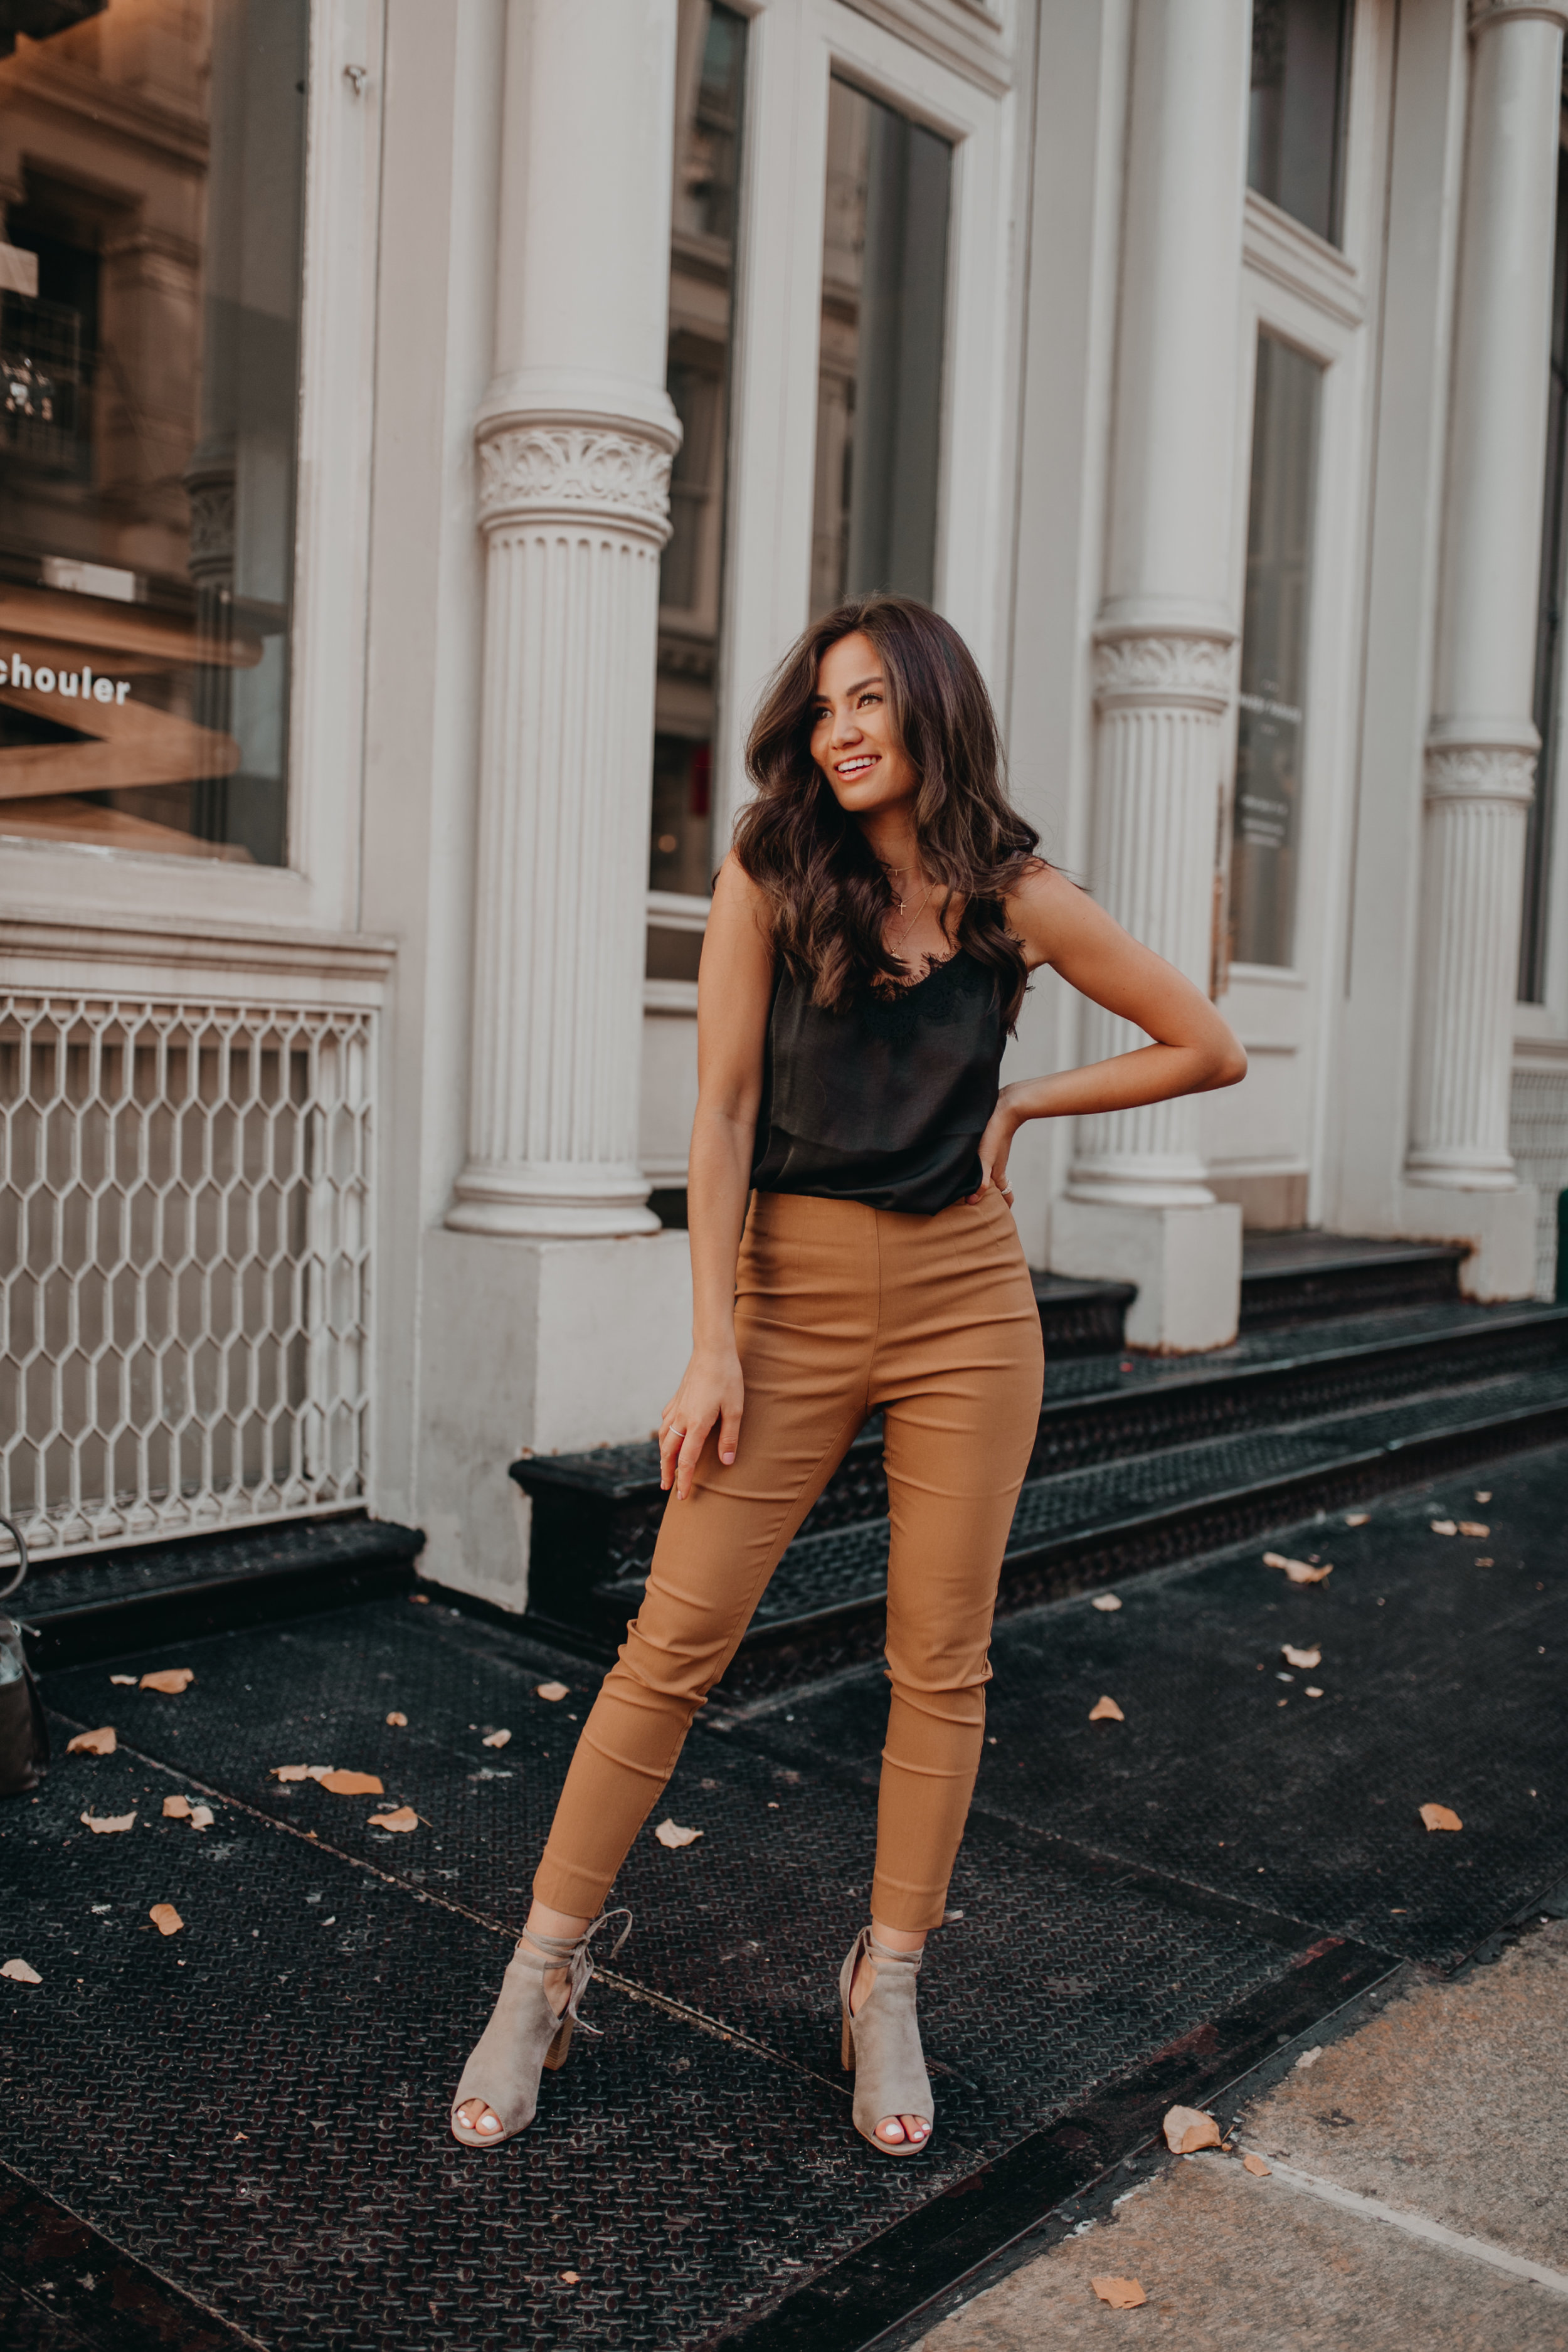 Caila Quinn The Bachelor Walmart Fashion We Dress America Fall Collection